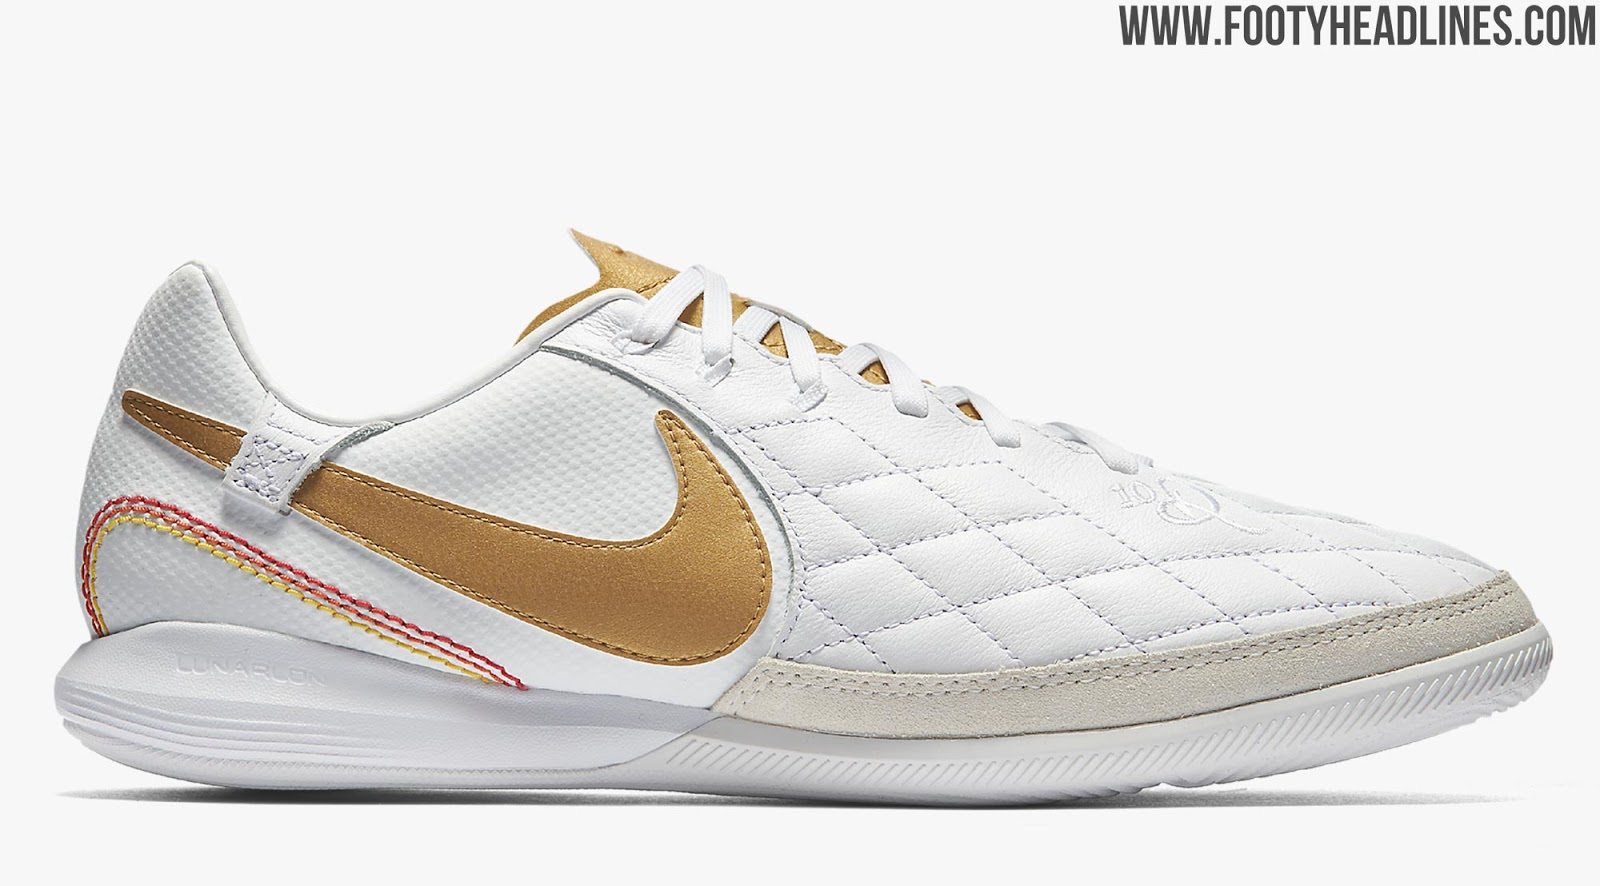 the latest b313b 748a9 White / Gold Nike TiempoX Ronaldinho 'Barcelona' Boots ...